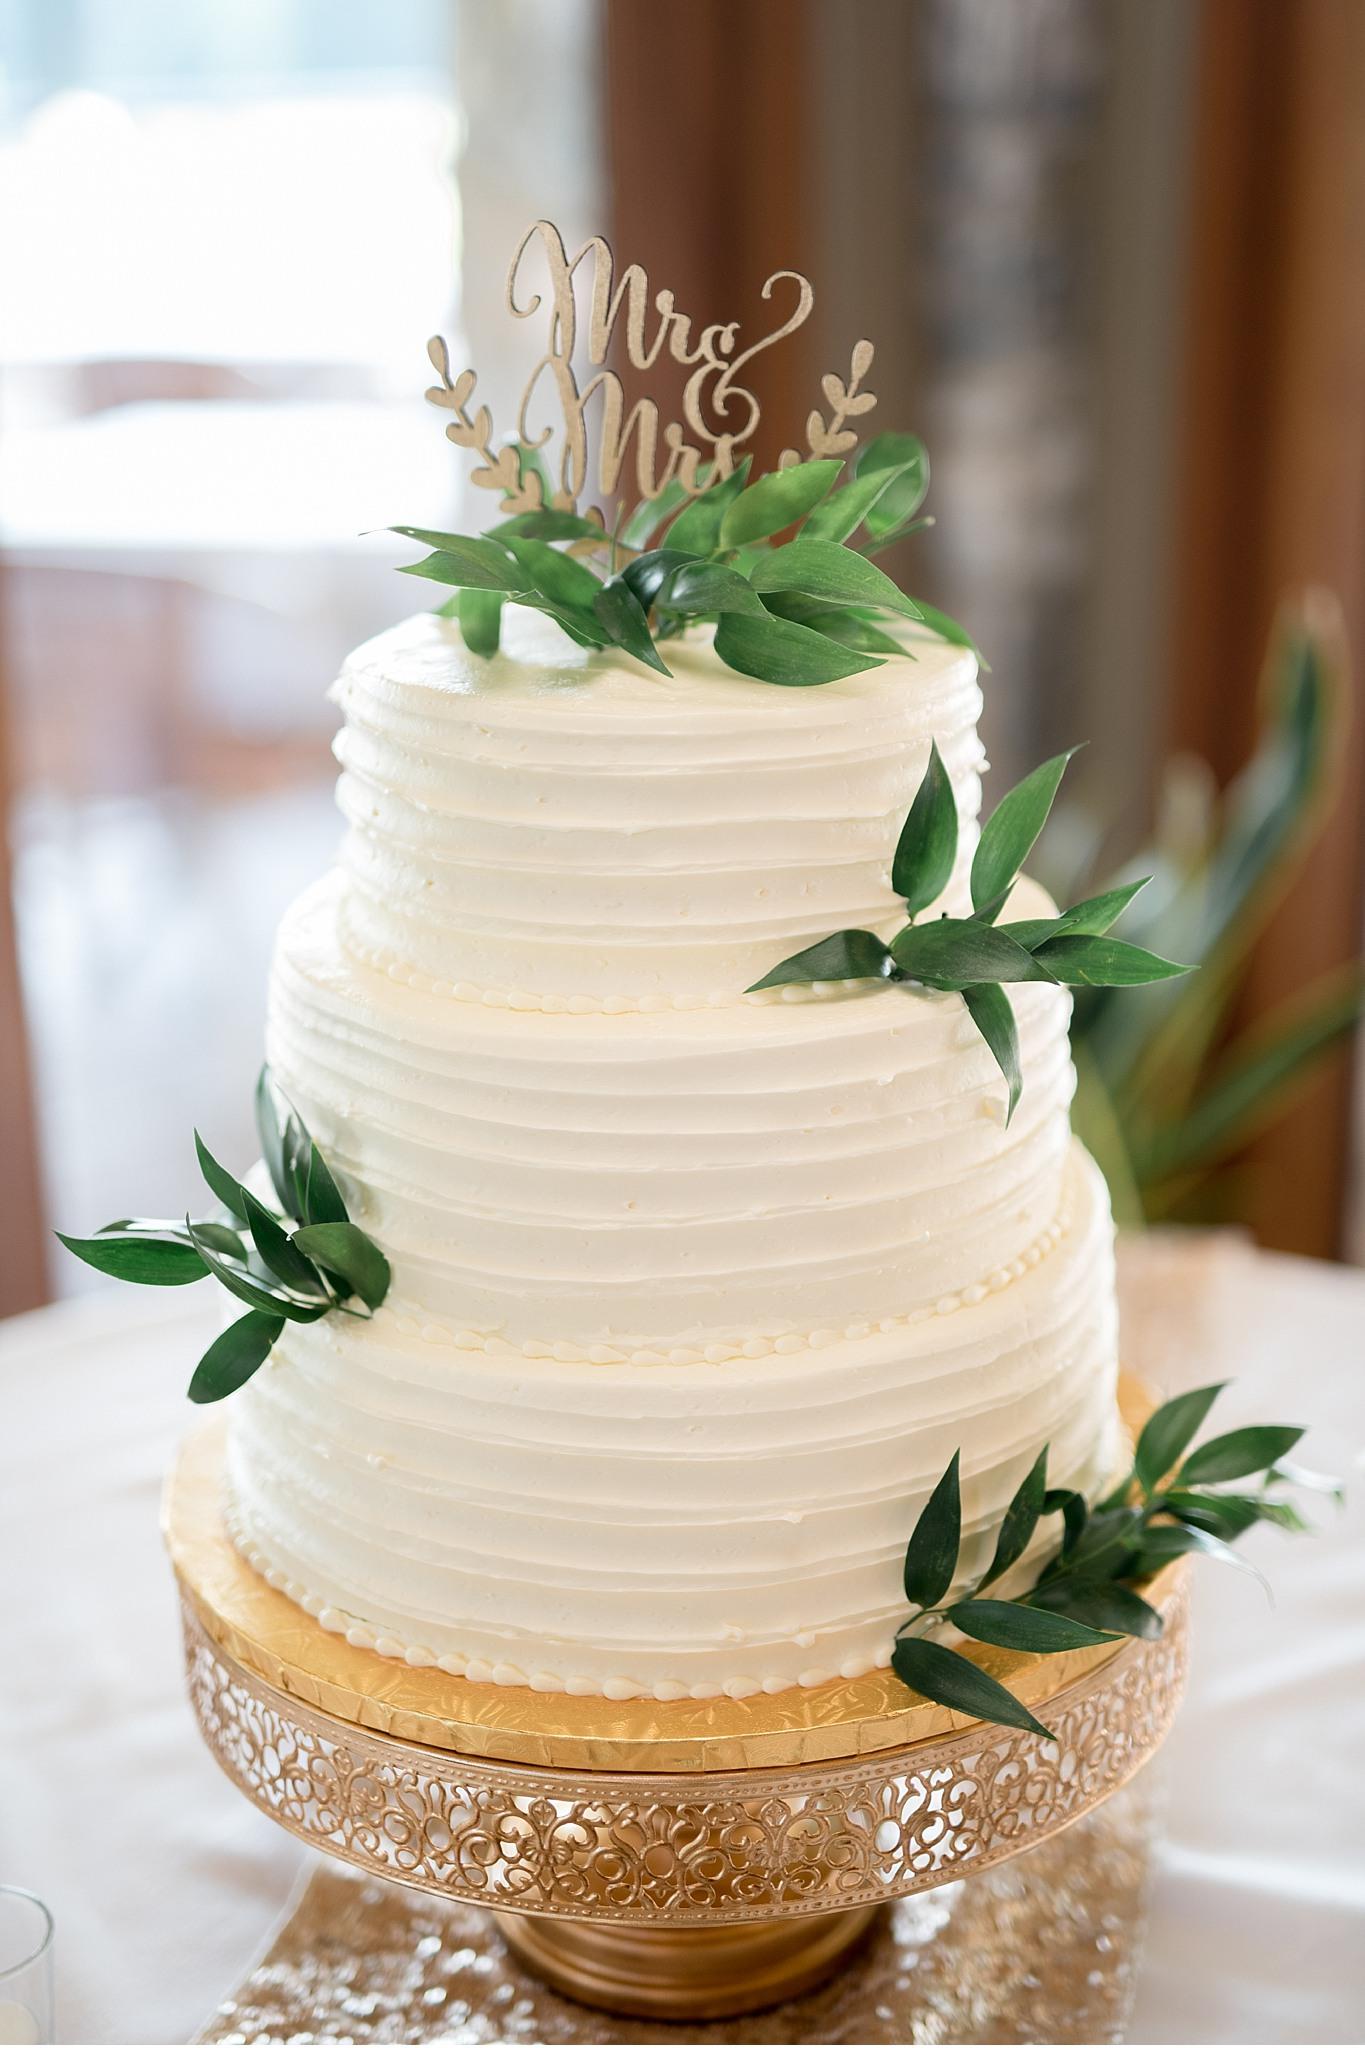 Cake details Hershey Gardens Hershey Country Club Summer beautiful wedding photography_1610.jpg